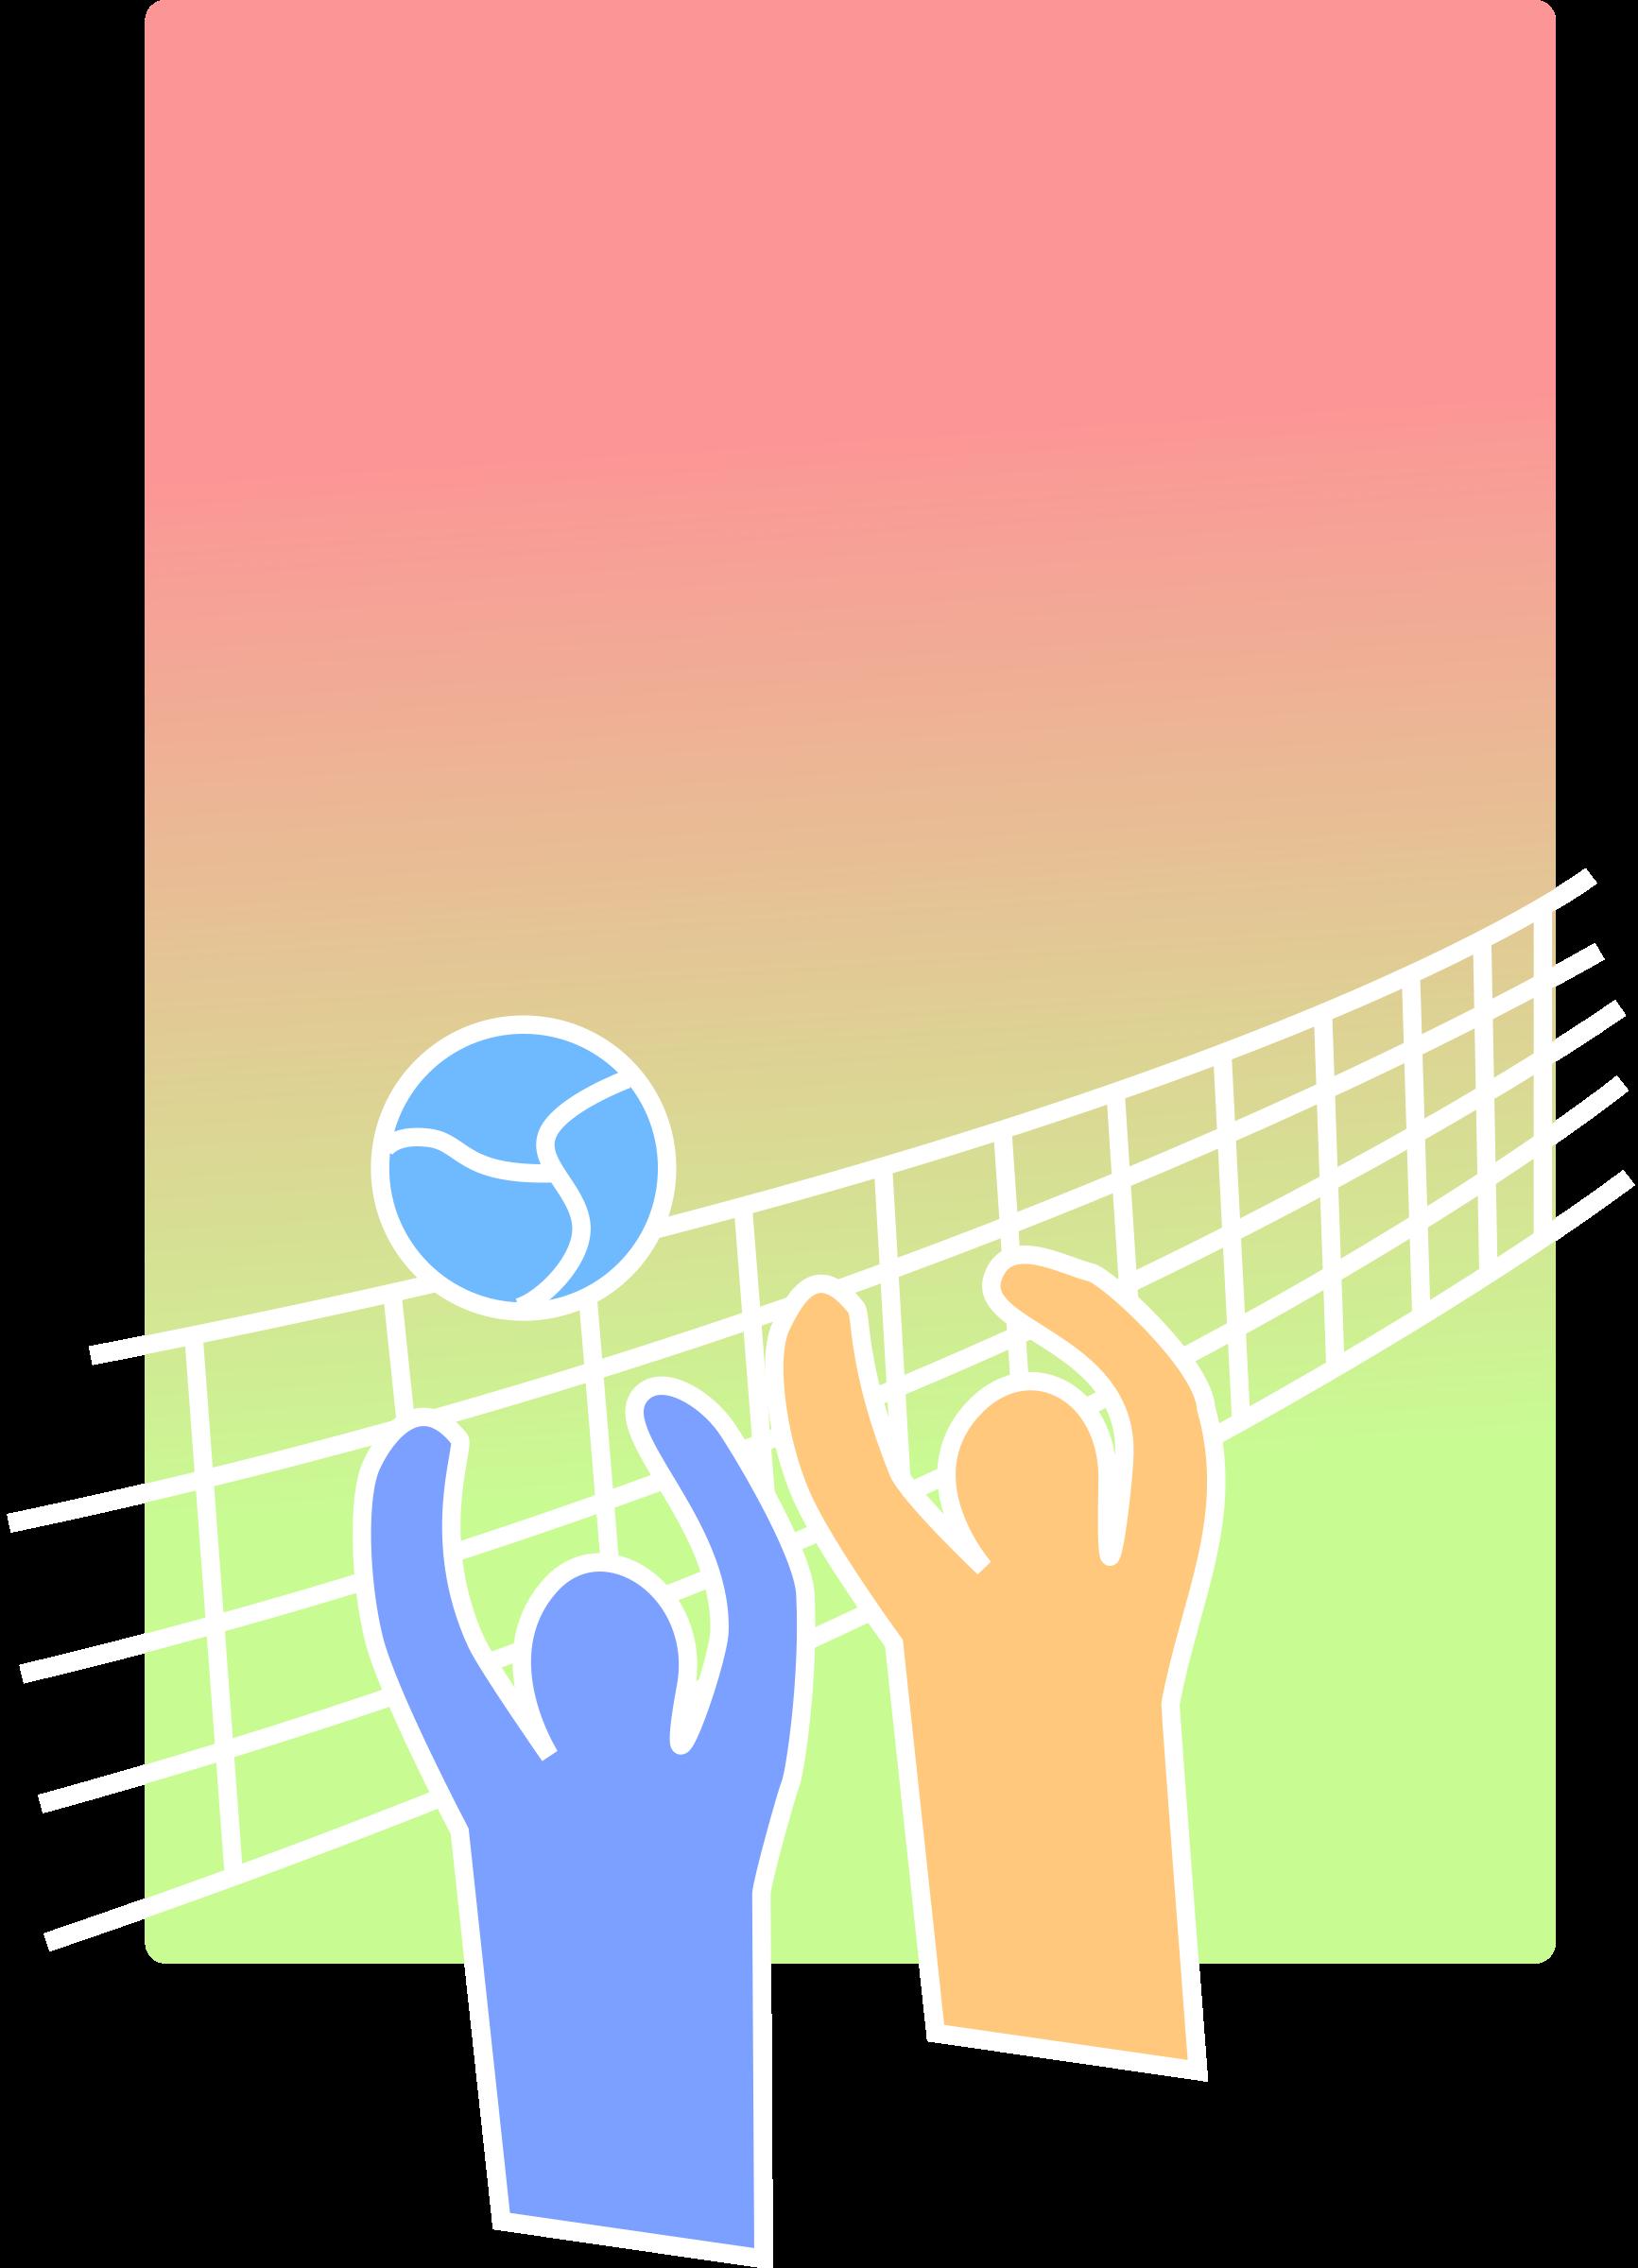 Volleyball hand